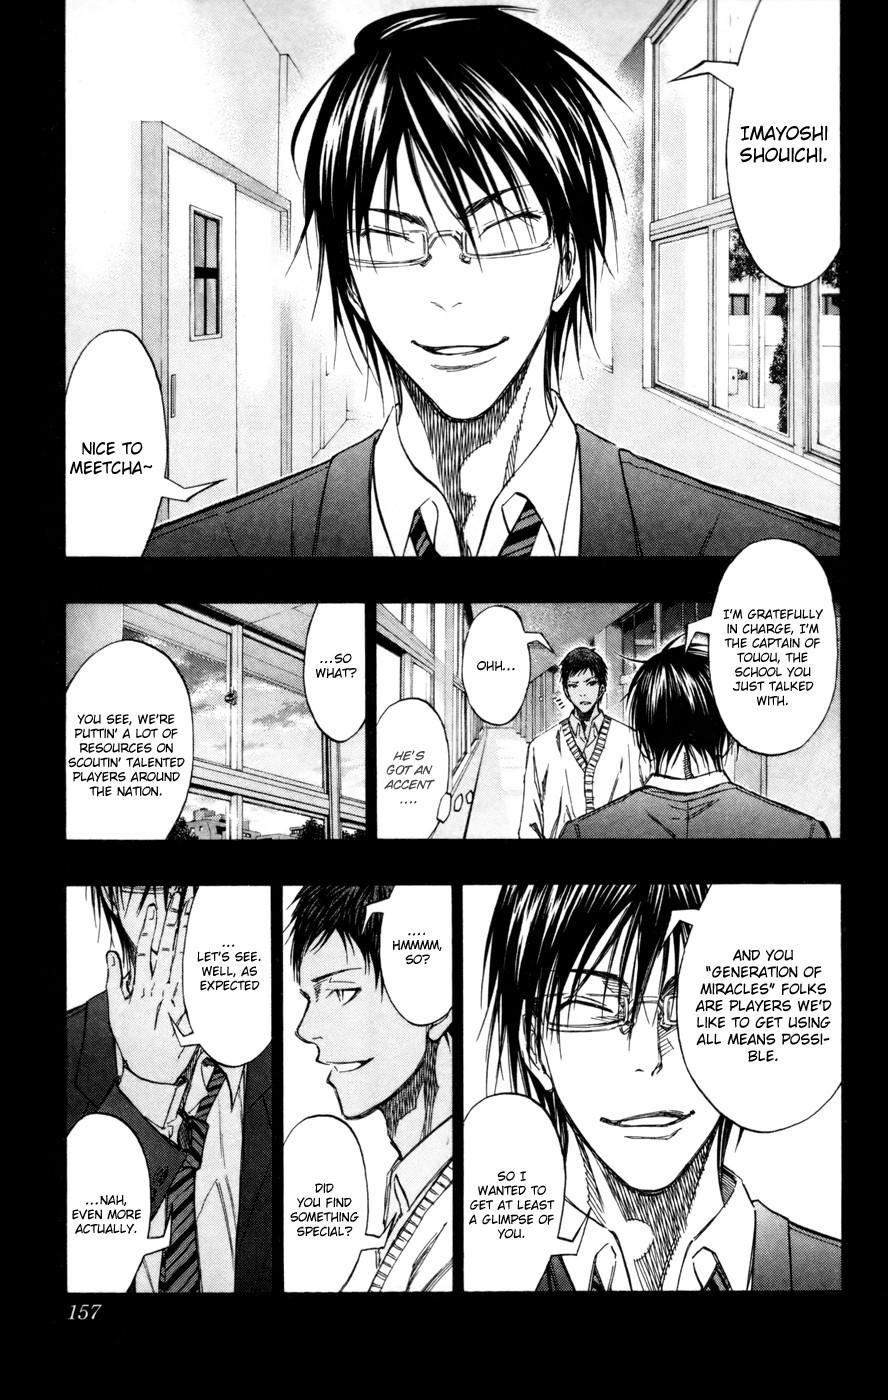 Kuroko no Basket Manga Chapter 134 - Image 11